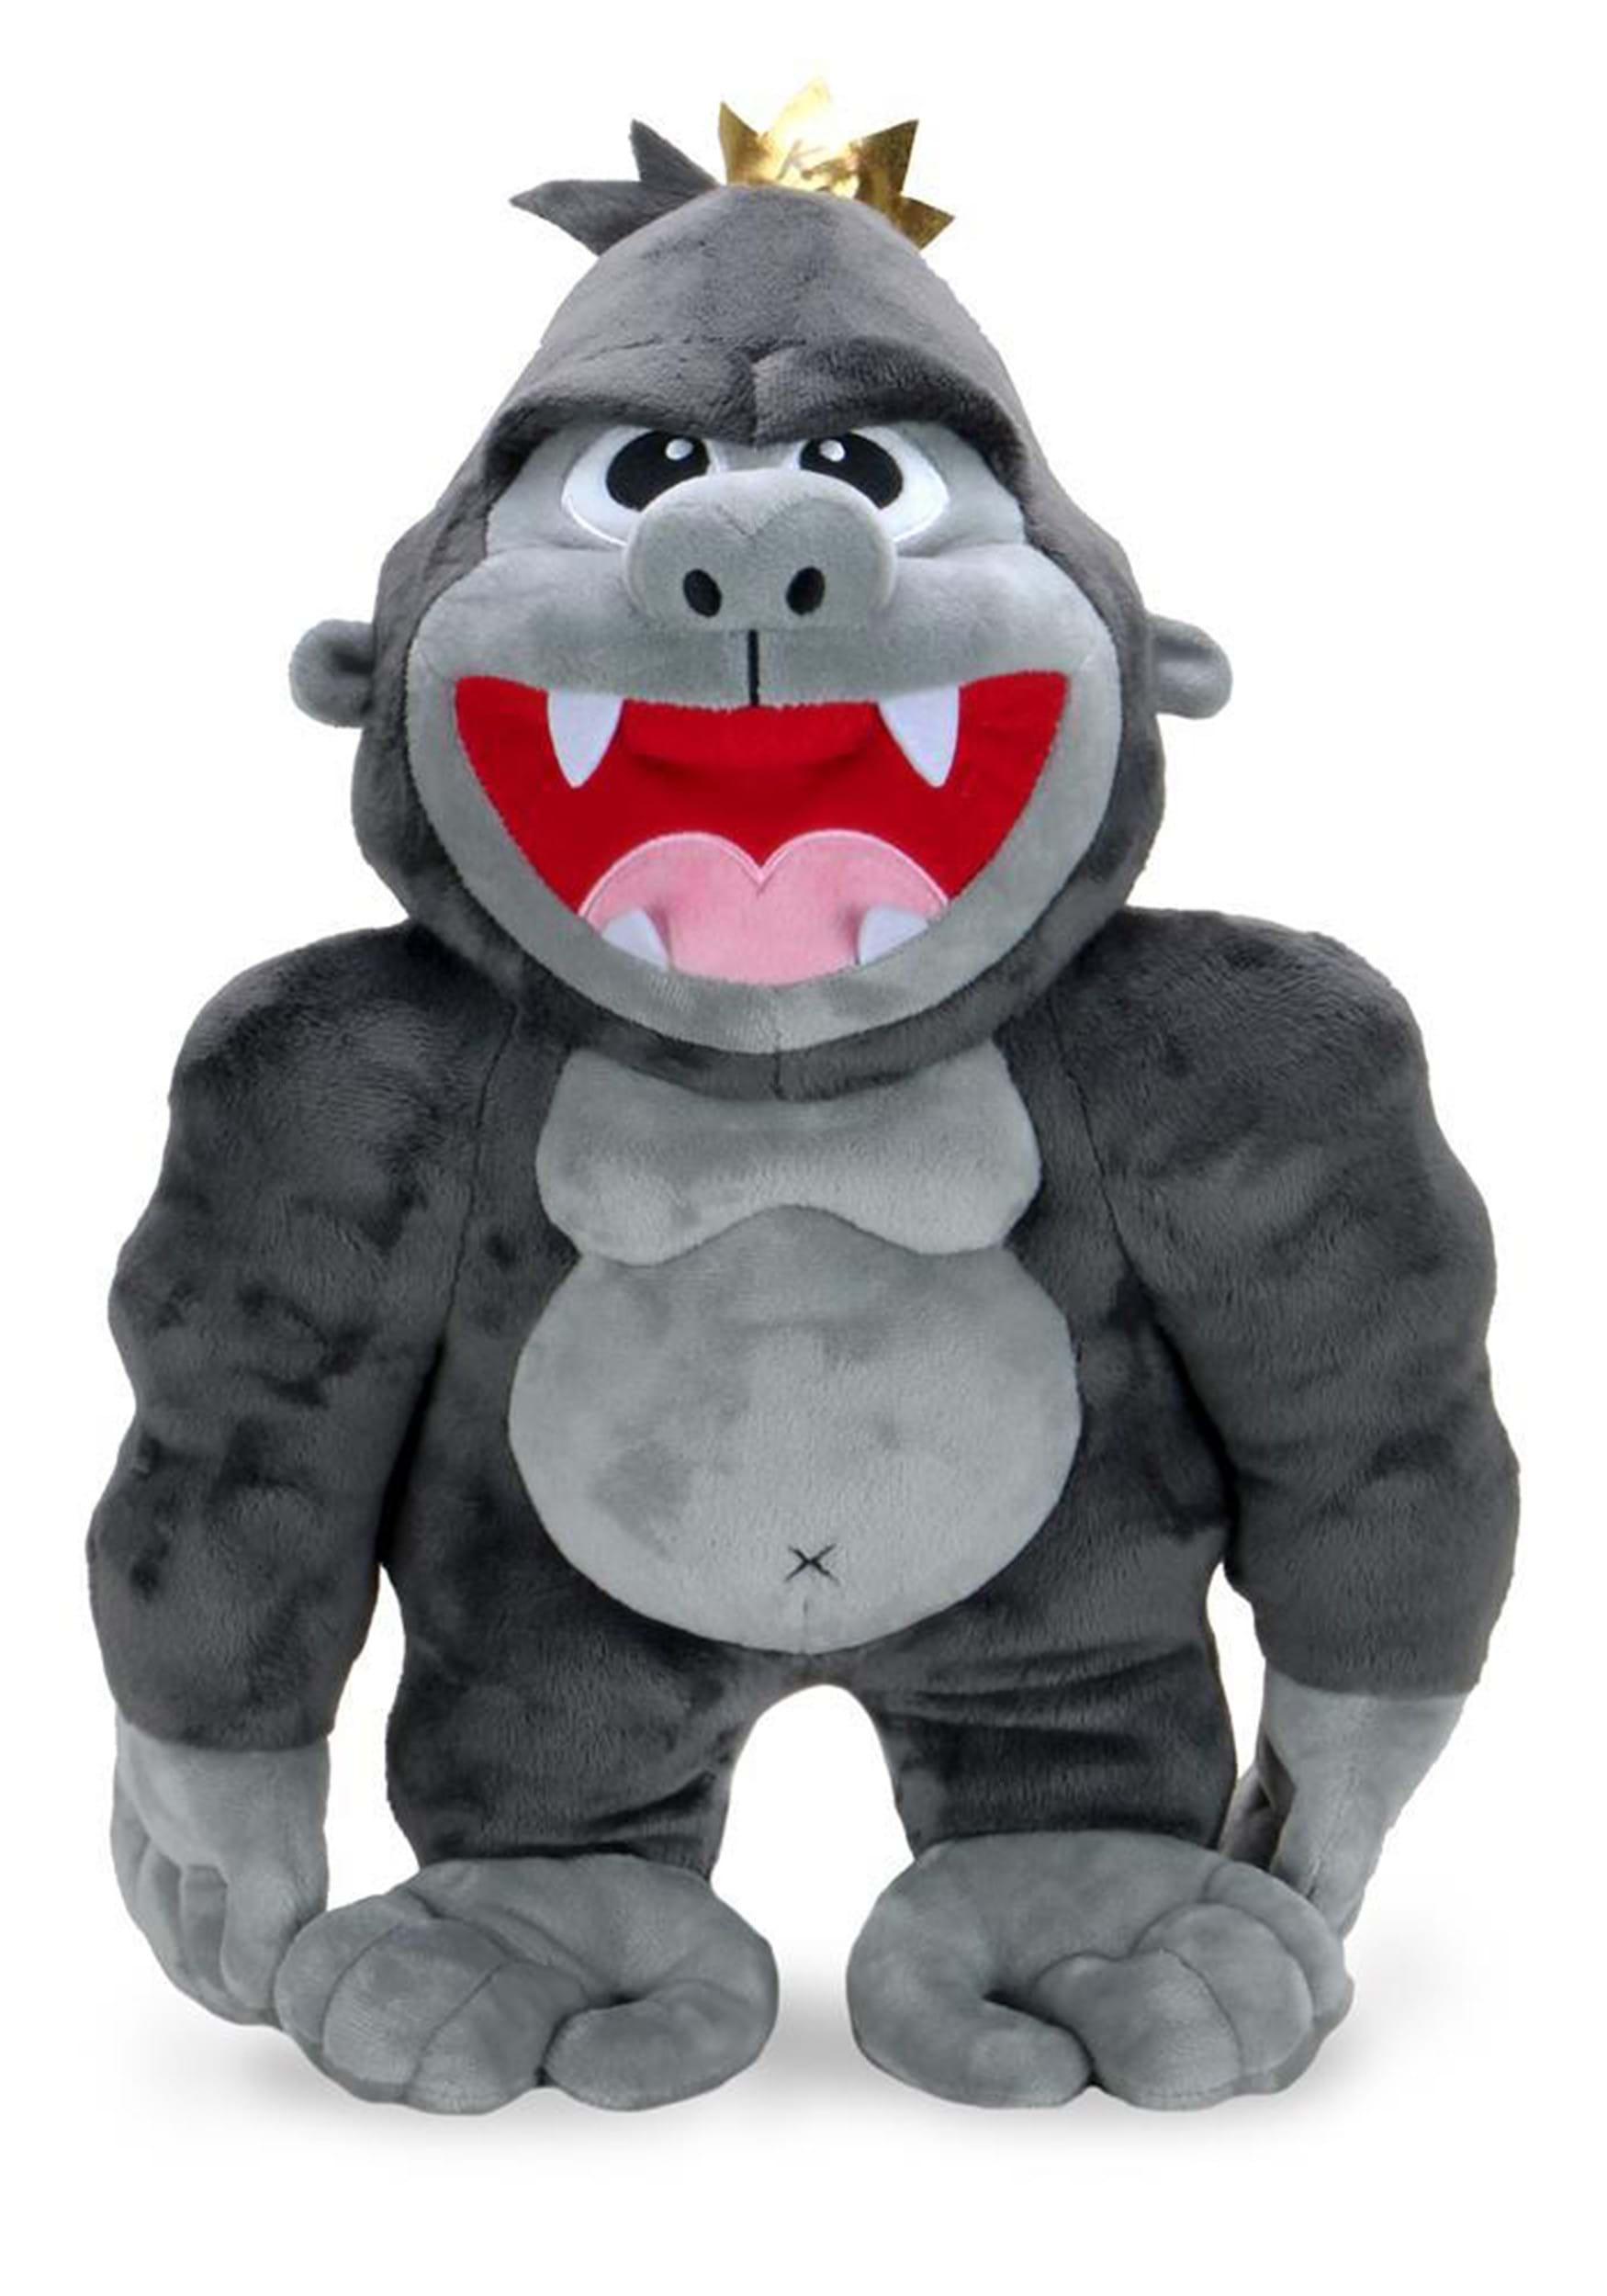 HugMe King Kong Stuffed Figure